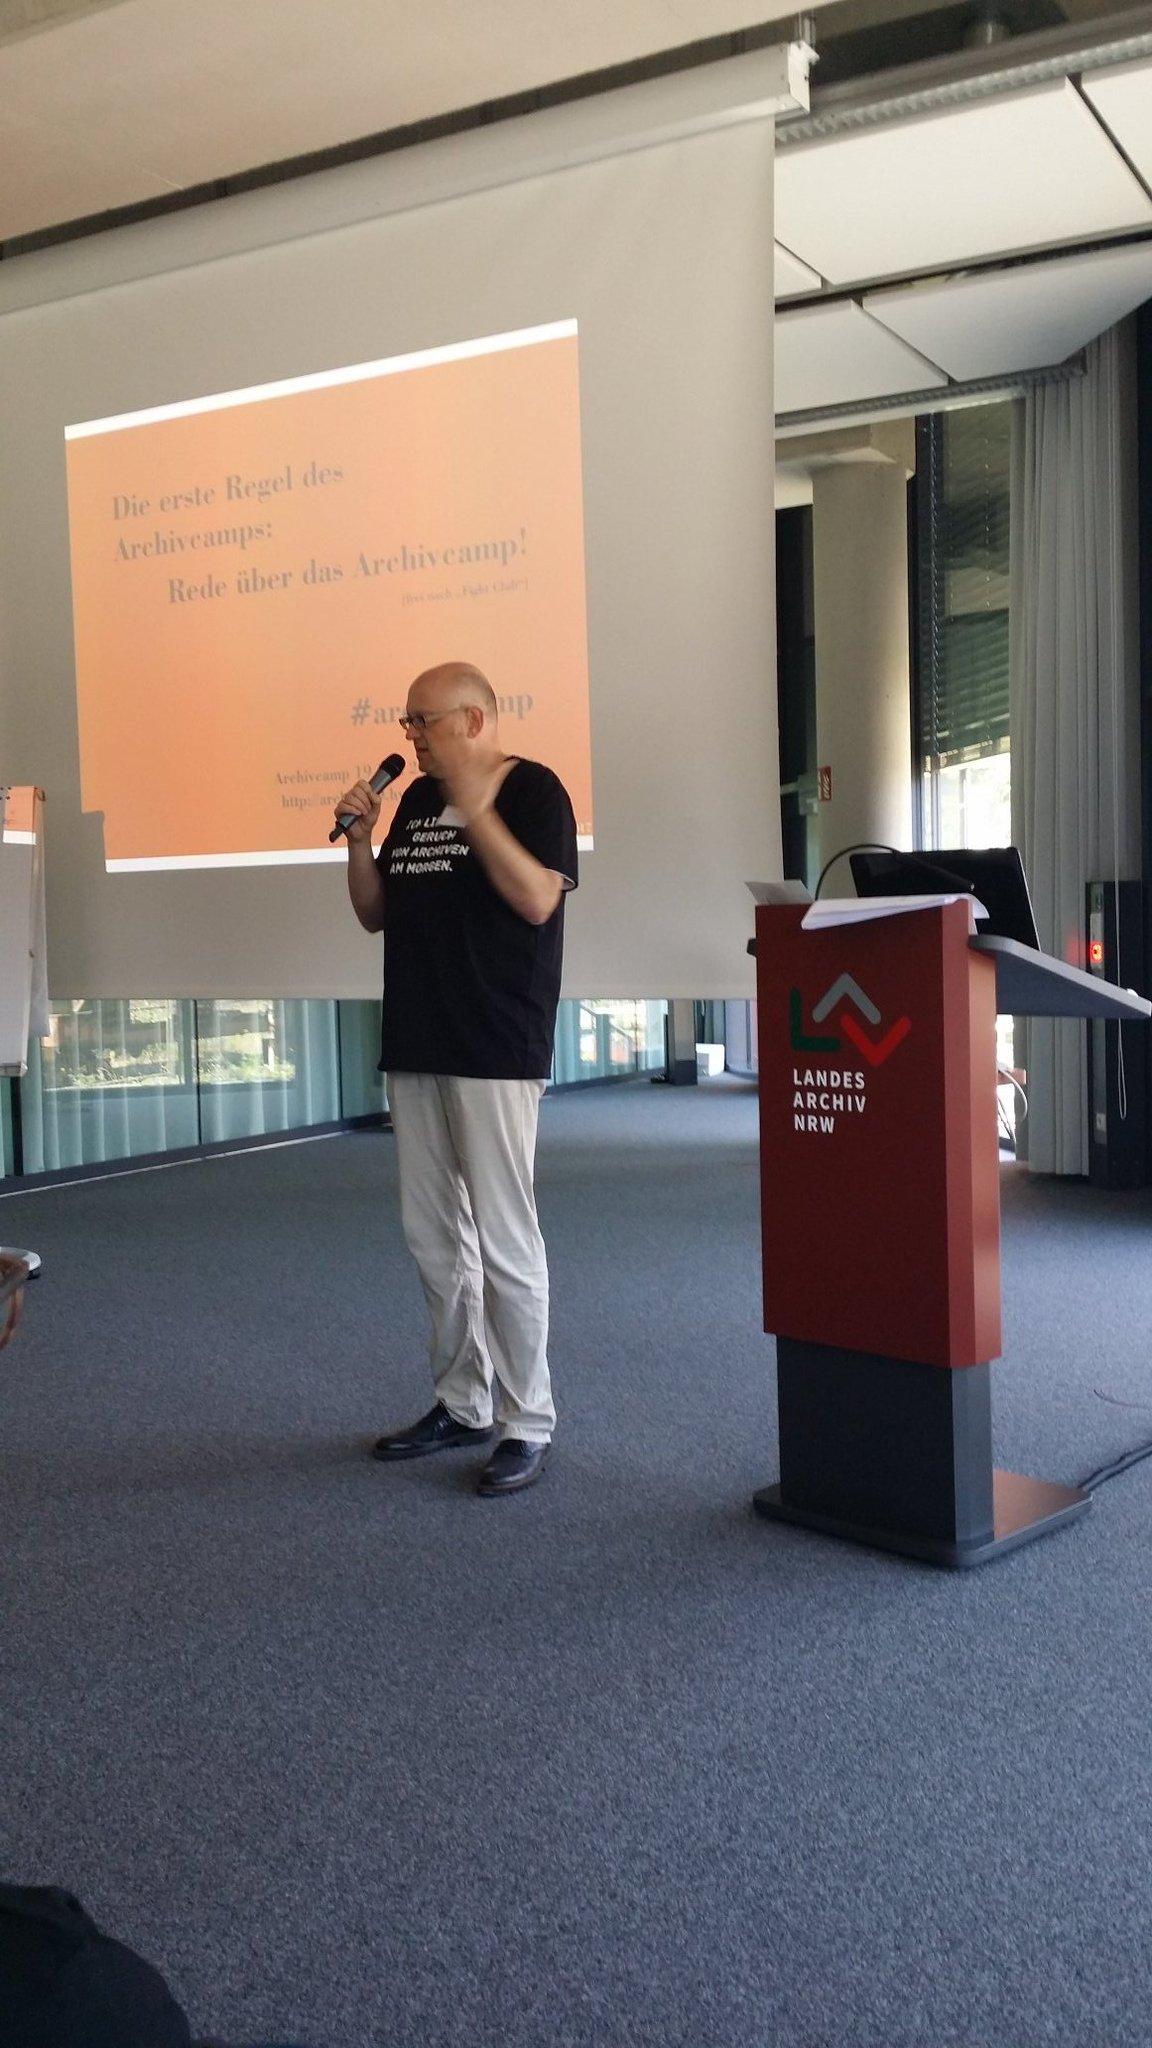 "Der ""Vorturner"". @HillenHist beim #archivcamp #archive20 https://t.co/uT7nGv10FD"